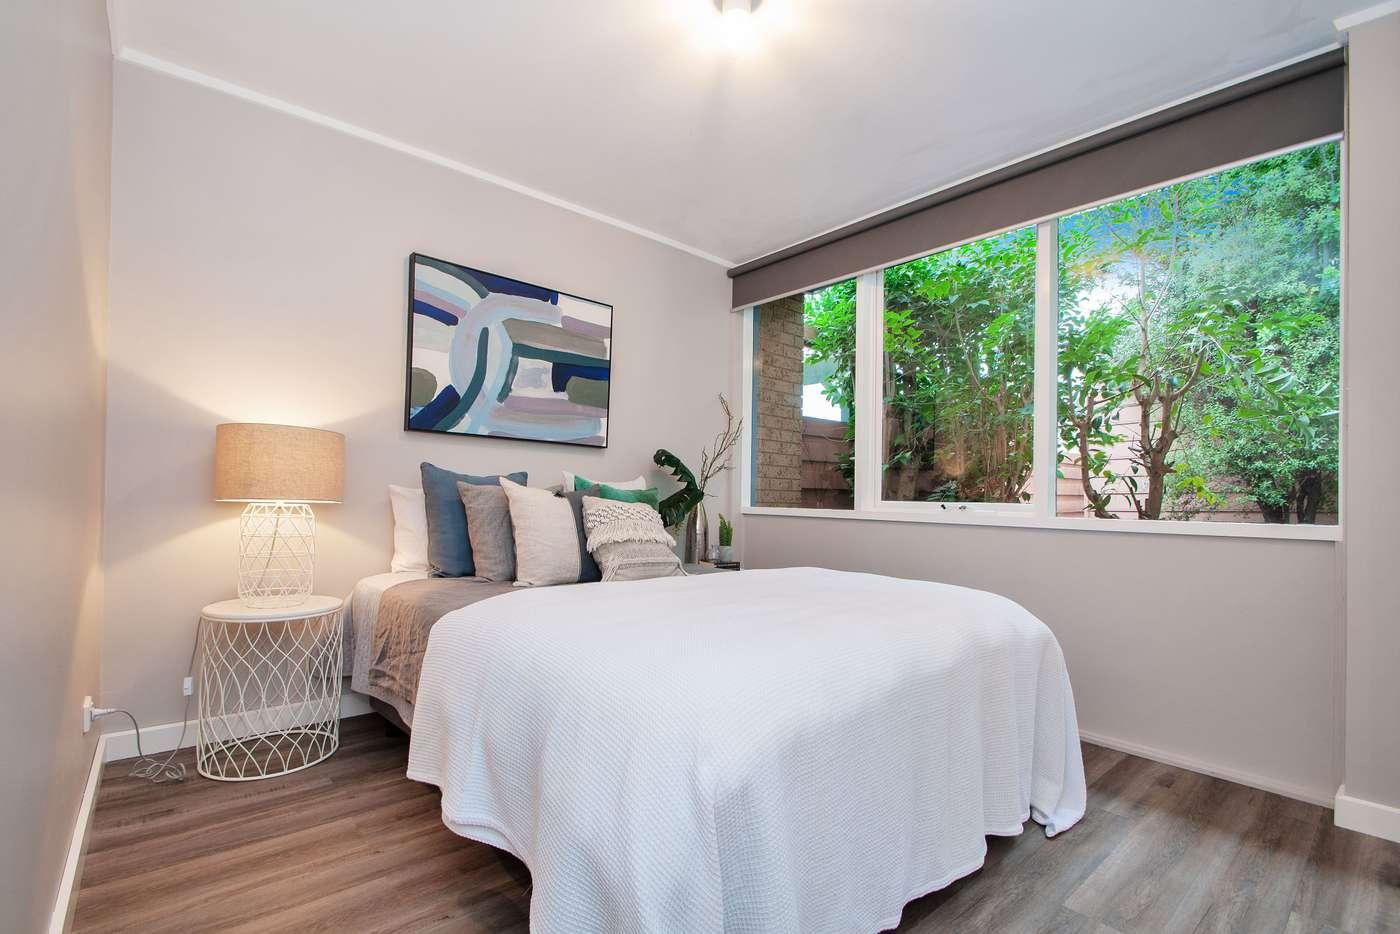 Fifth view of Homely unit listing, U12/8-12 Landale Avenue, Croydon VIC 3136